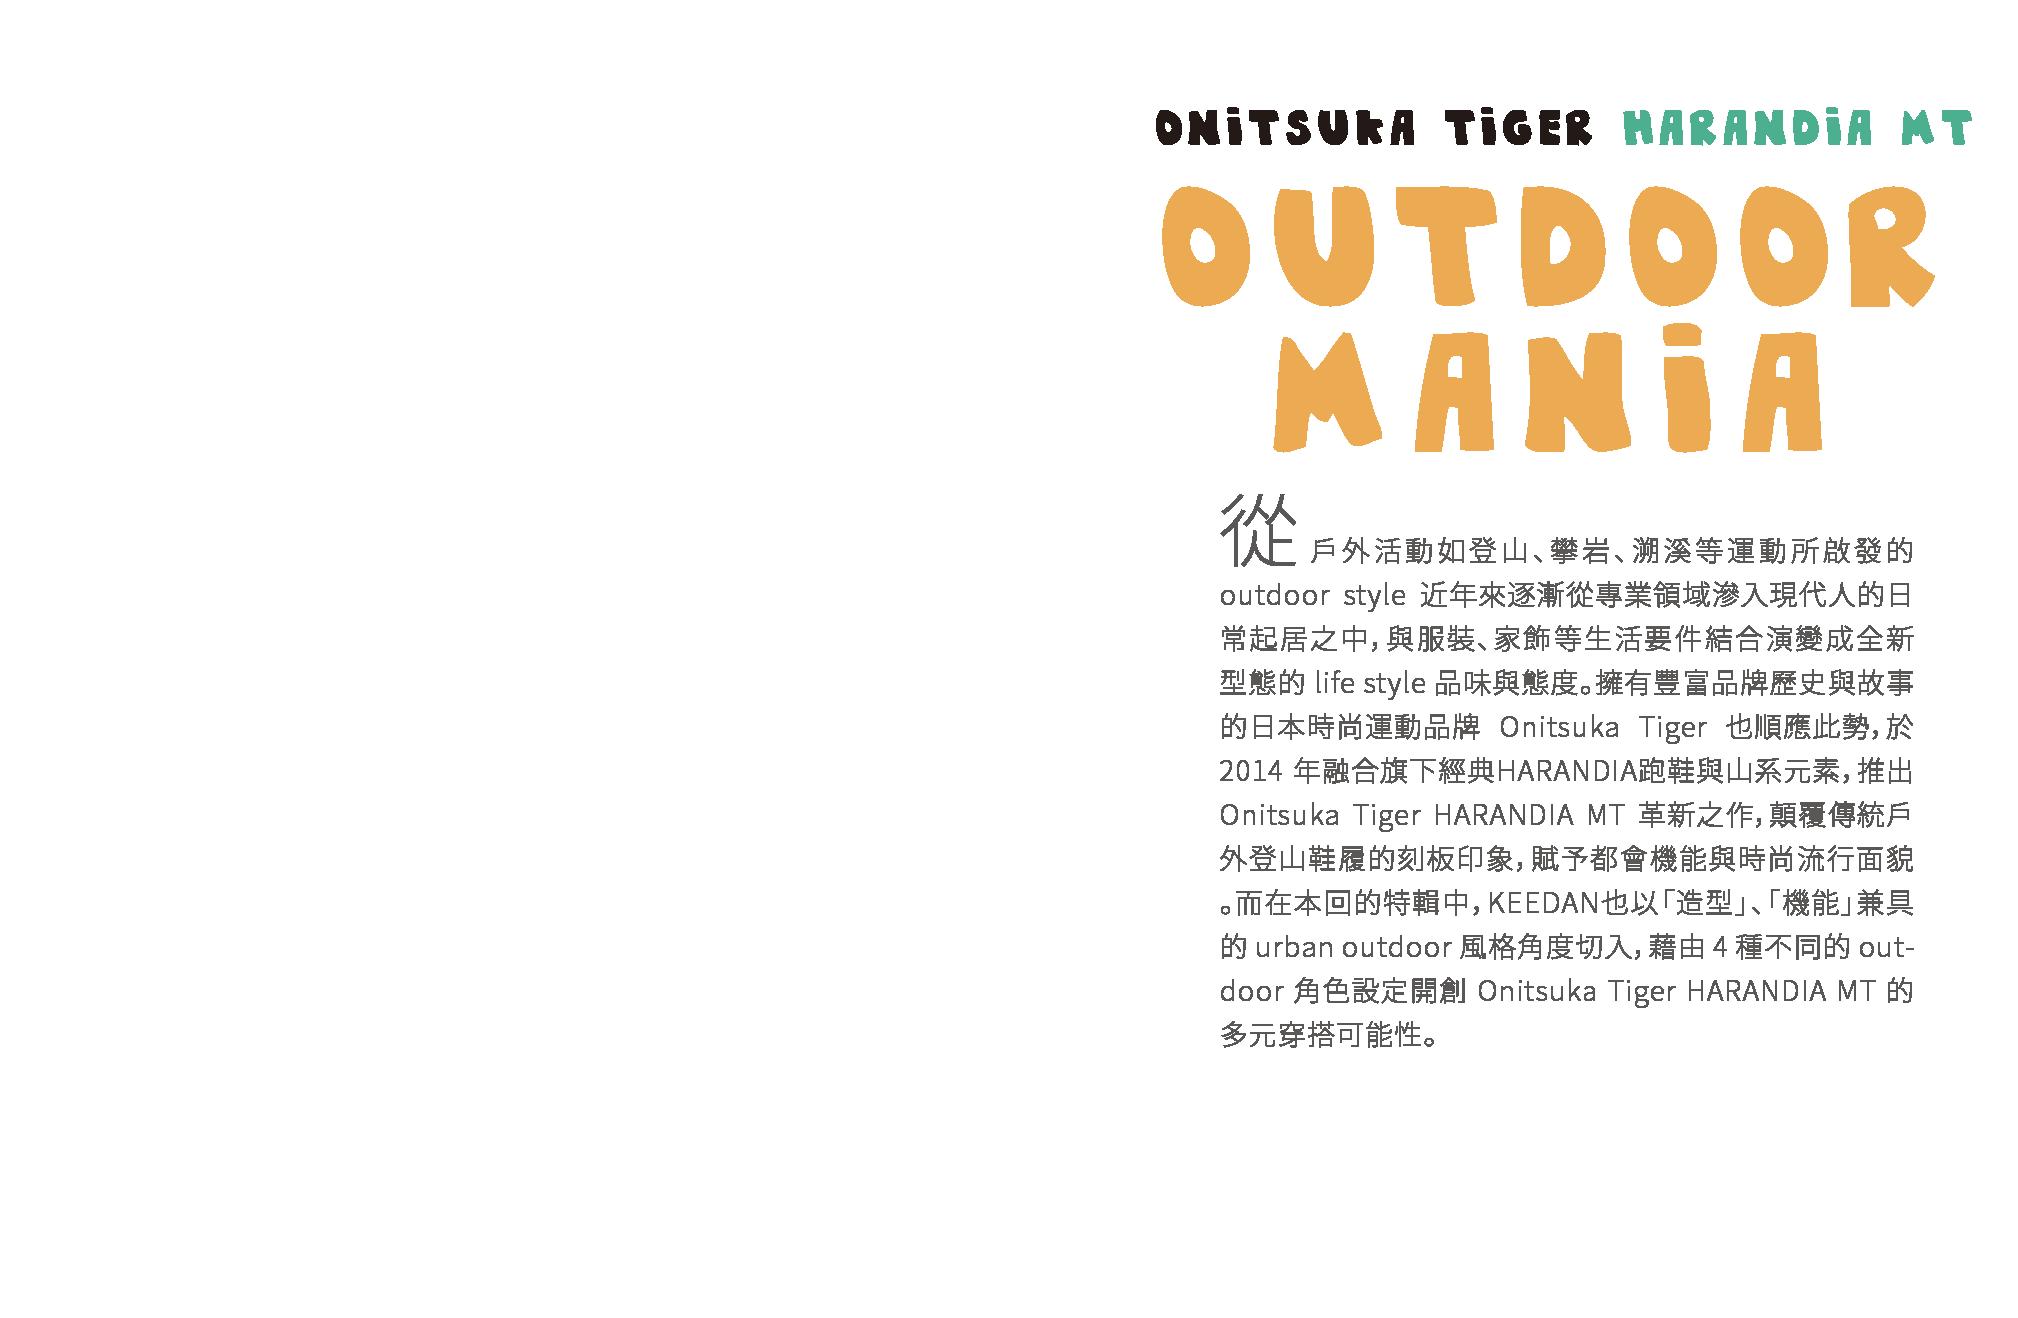 Ontisuka Tiger Editorial 'Outdoor Mania'